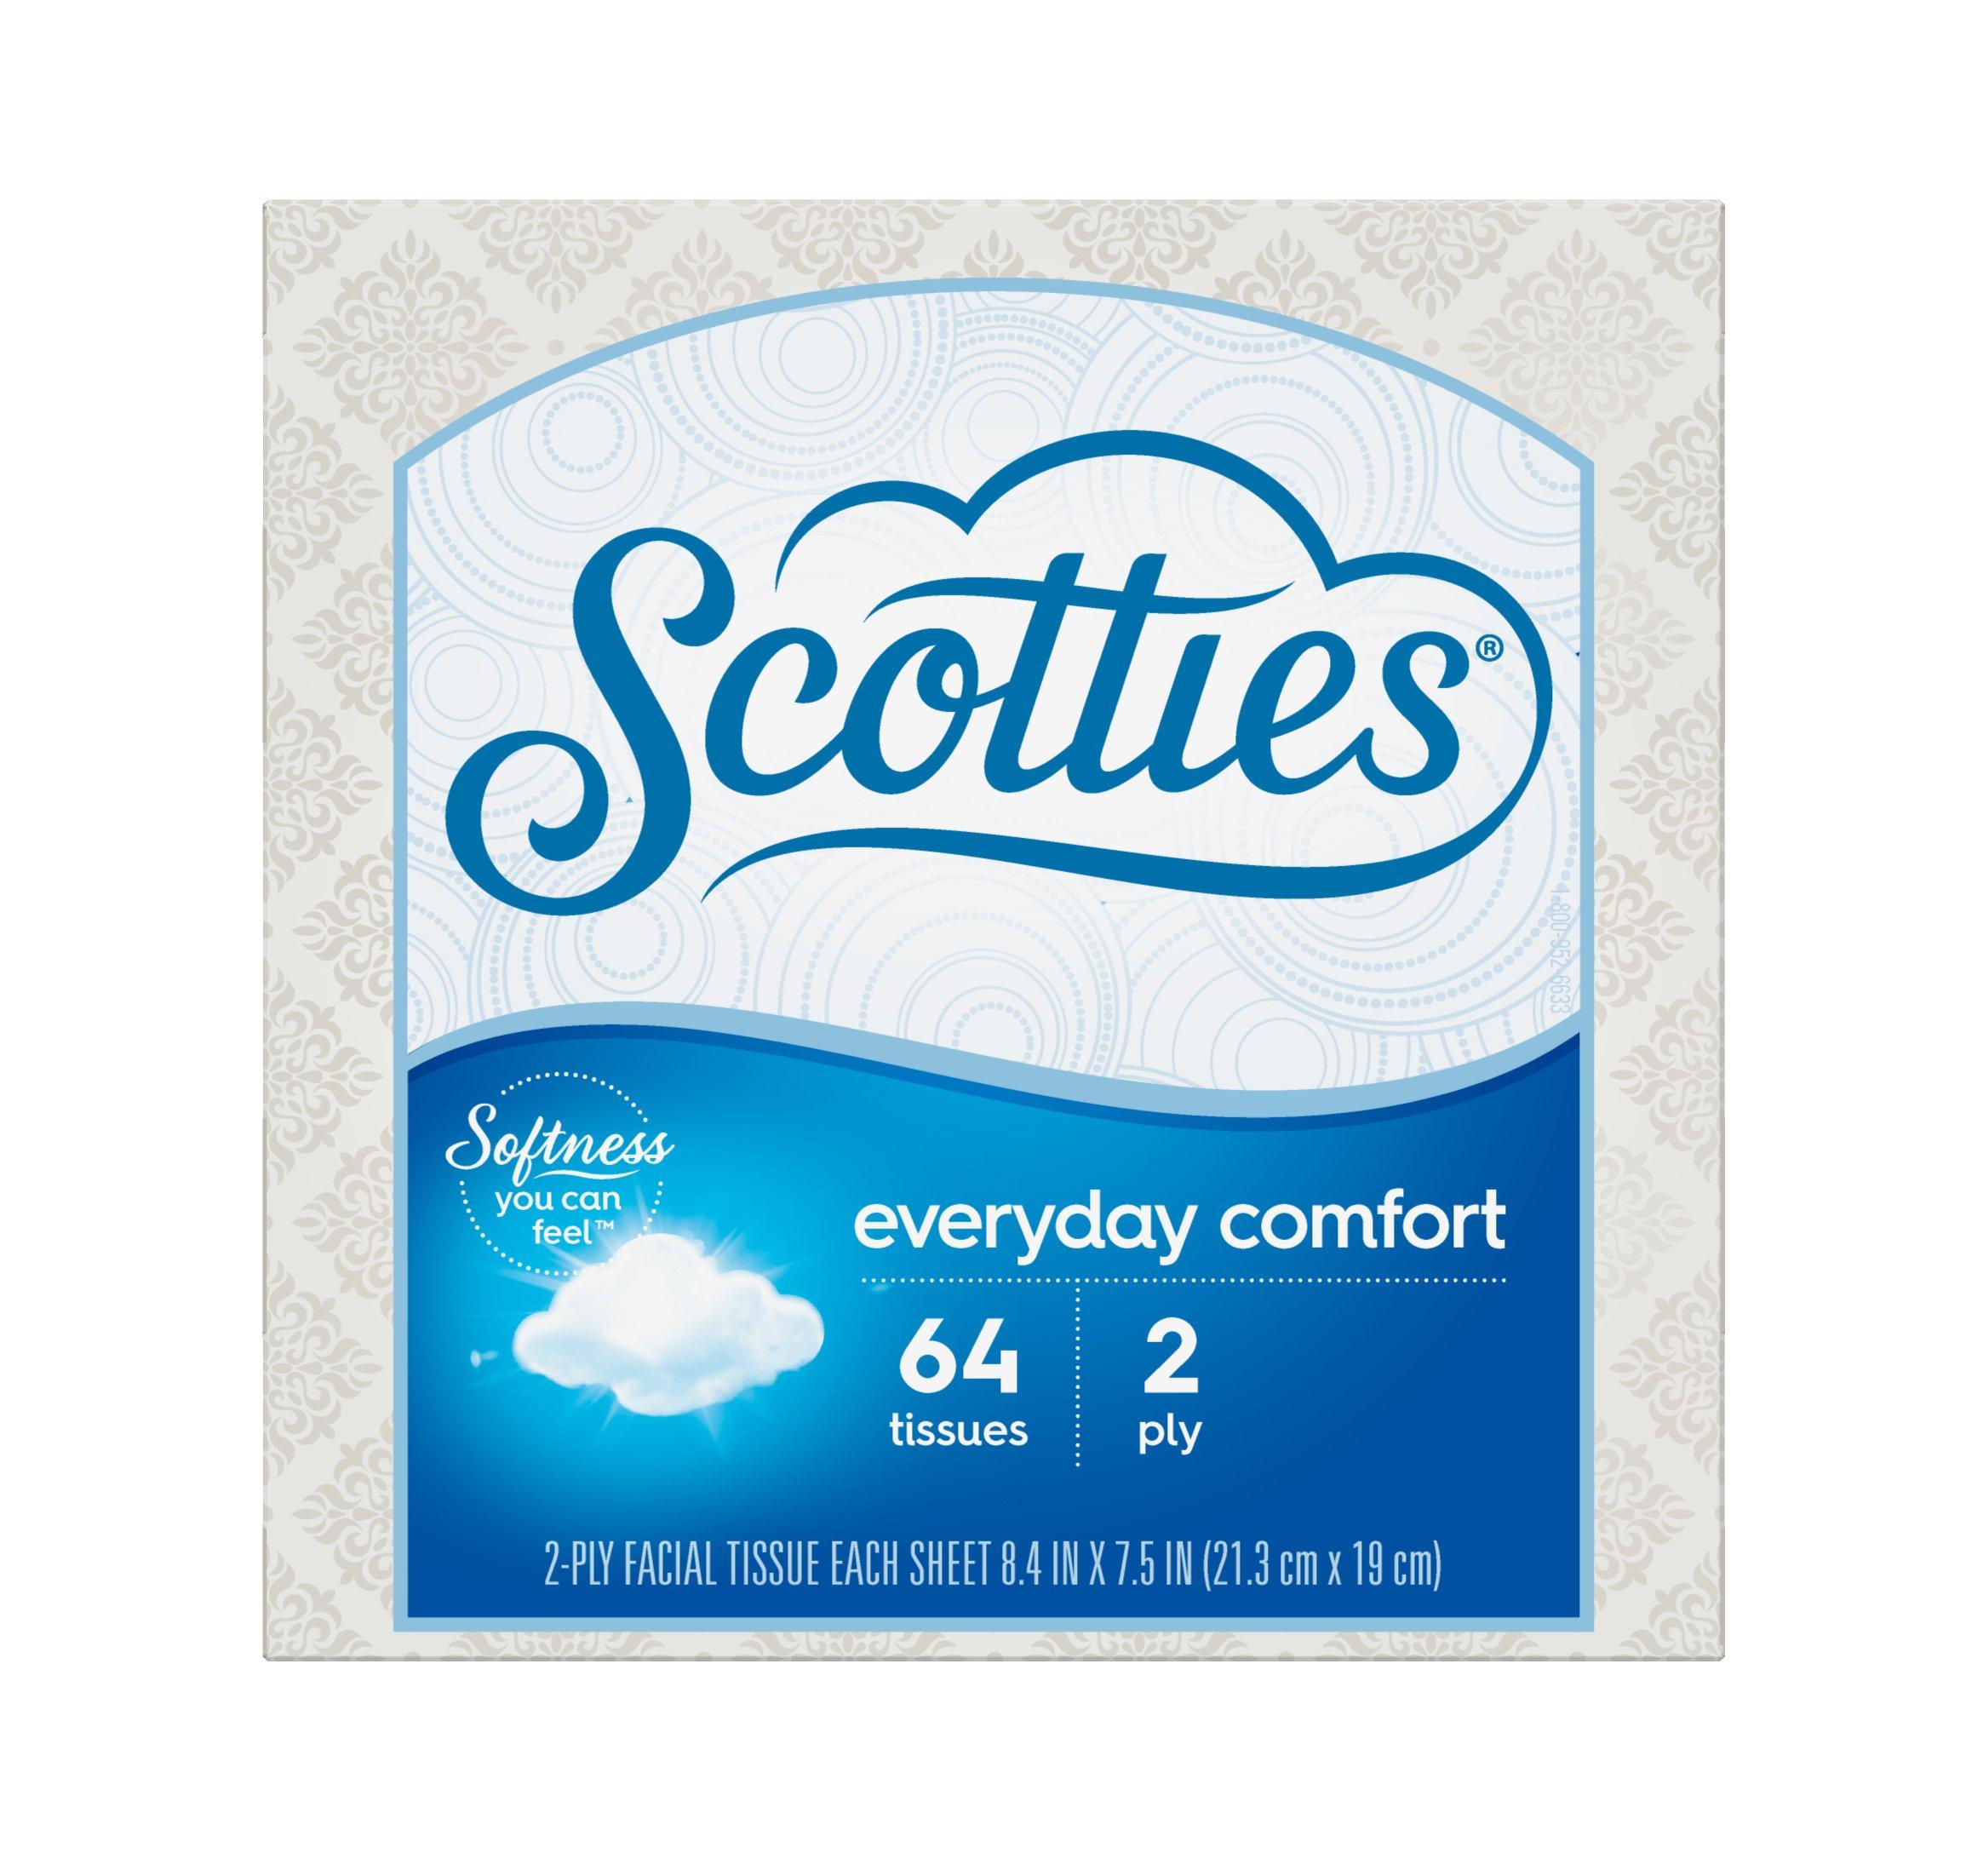 Scotties Everyday Comfort Facial Tissues, 64 Count